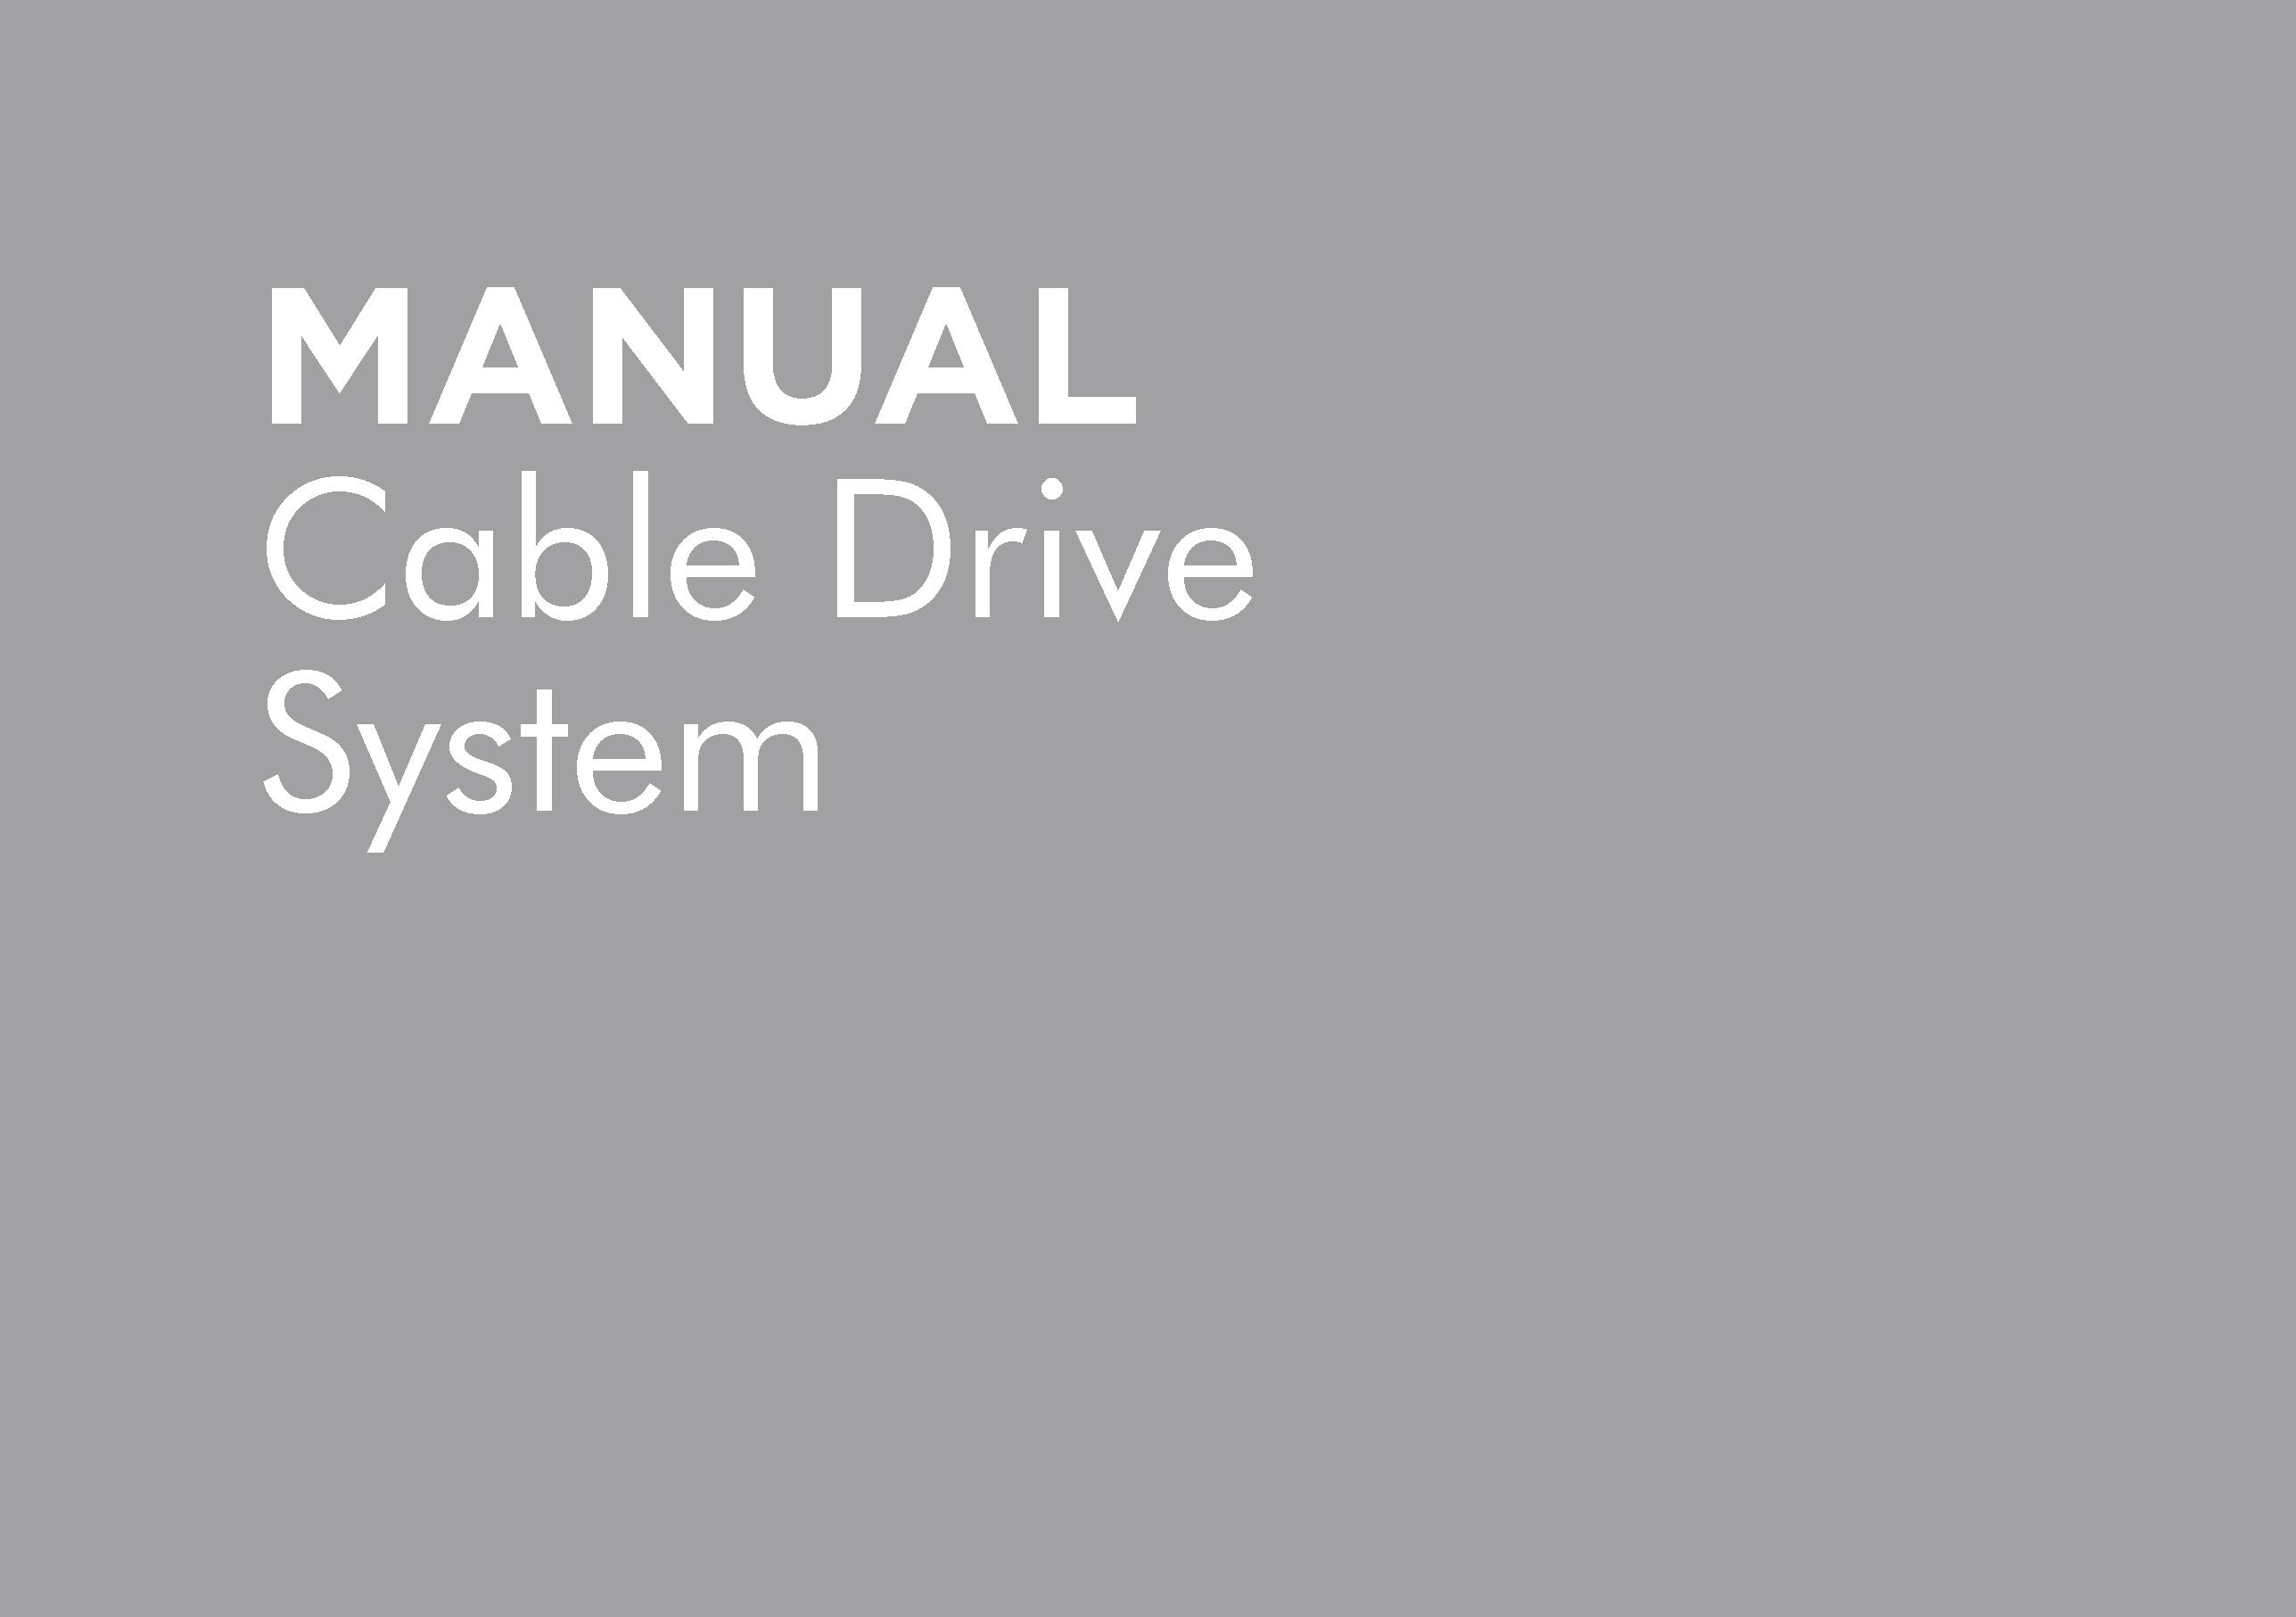 HT-POMCD2012A – CABLE DRIVE SYSTEM